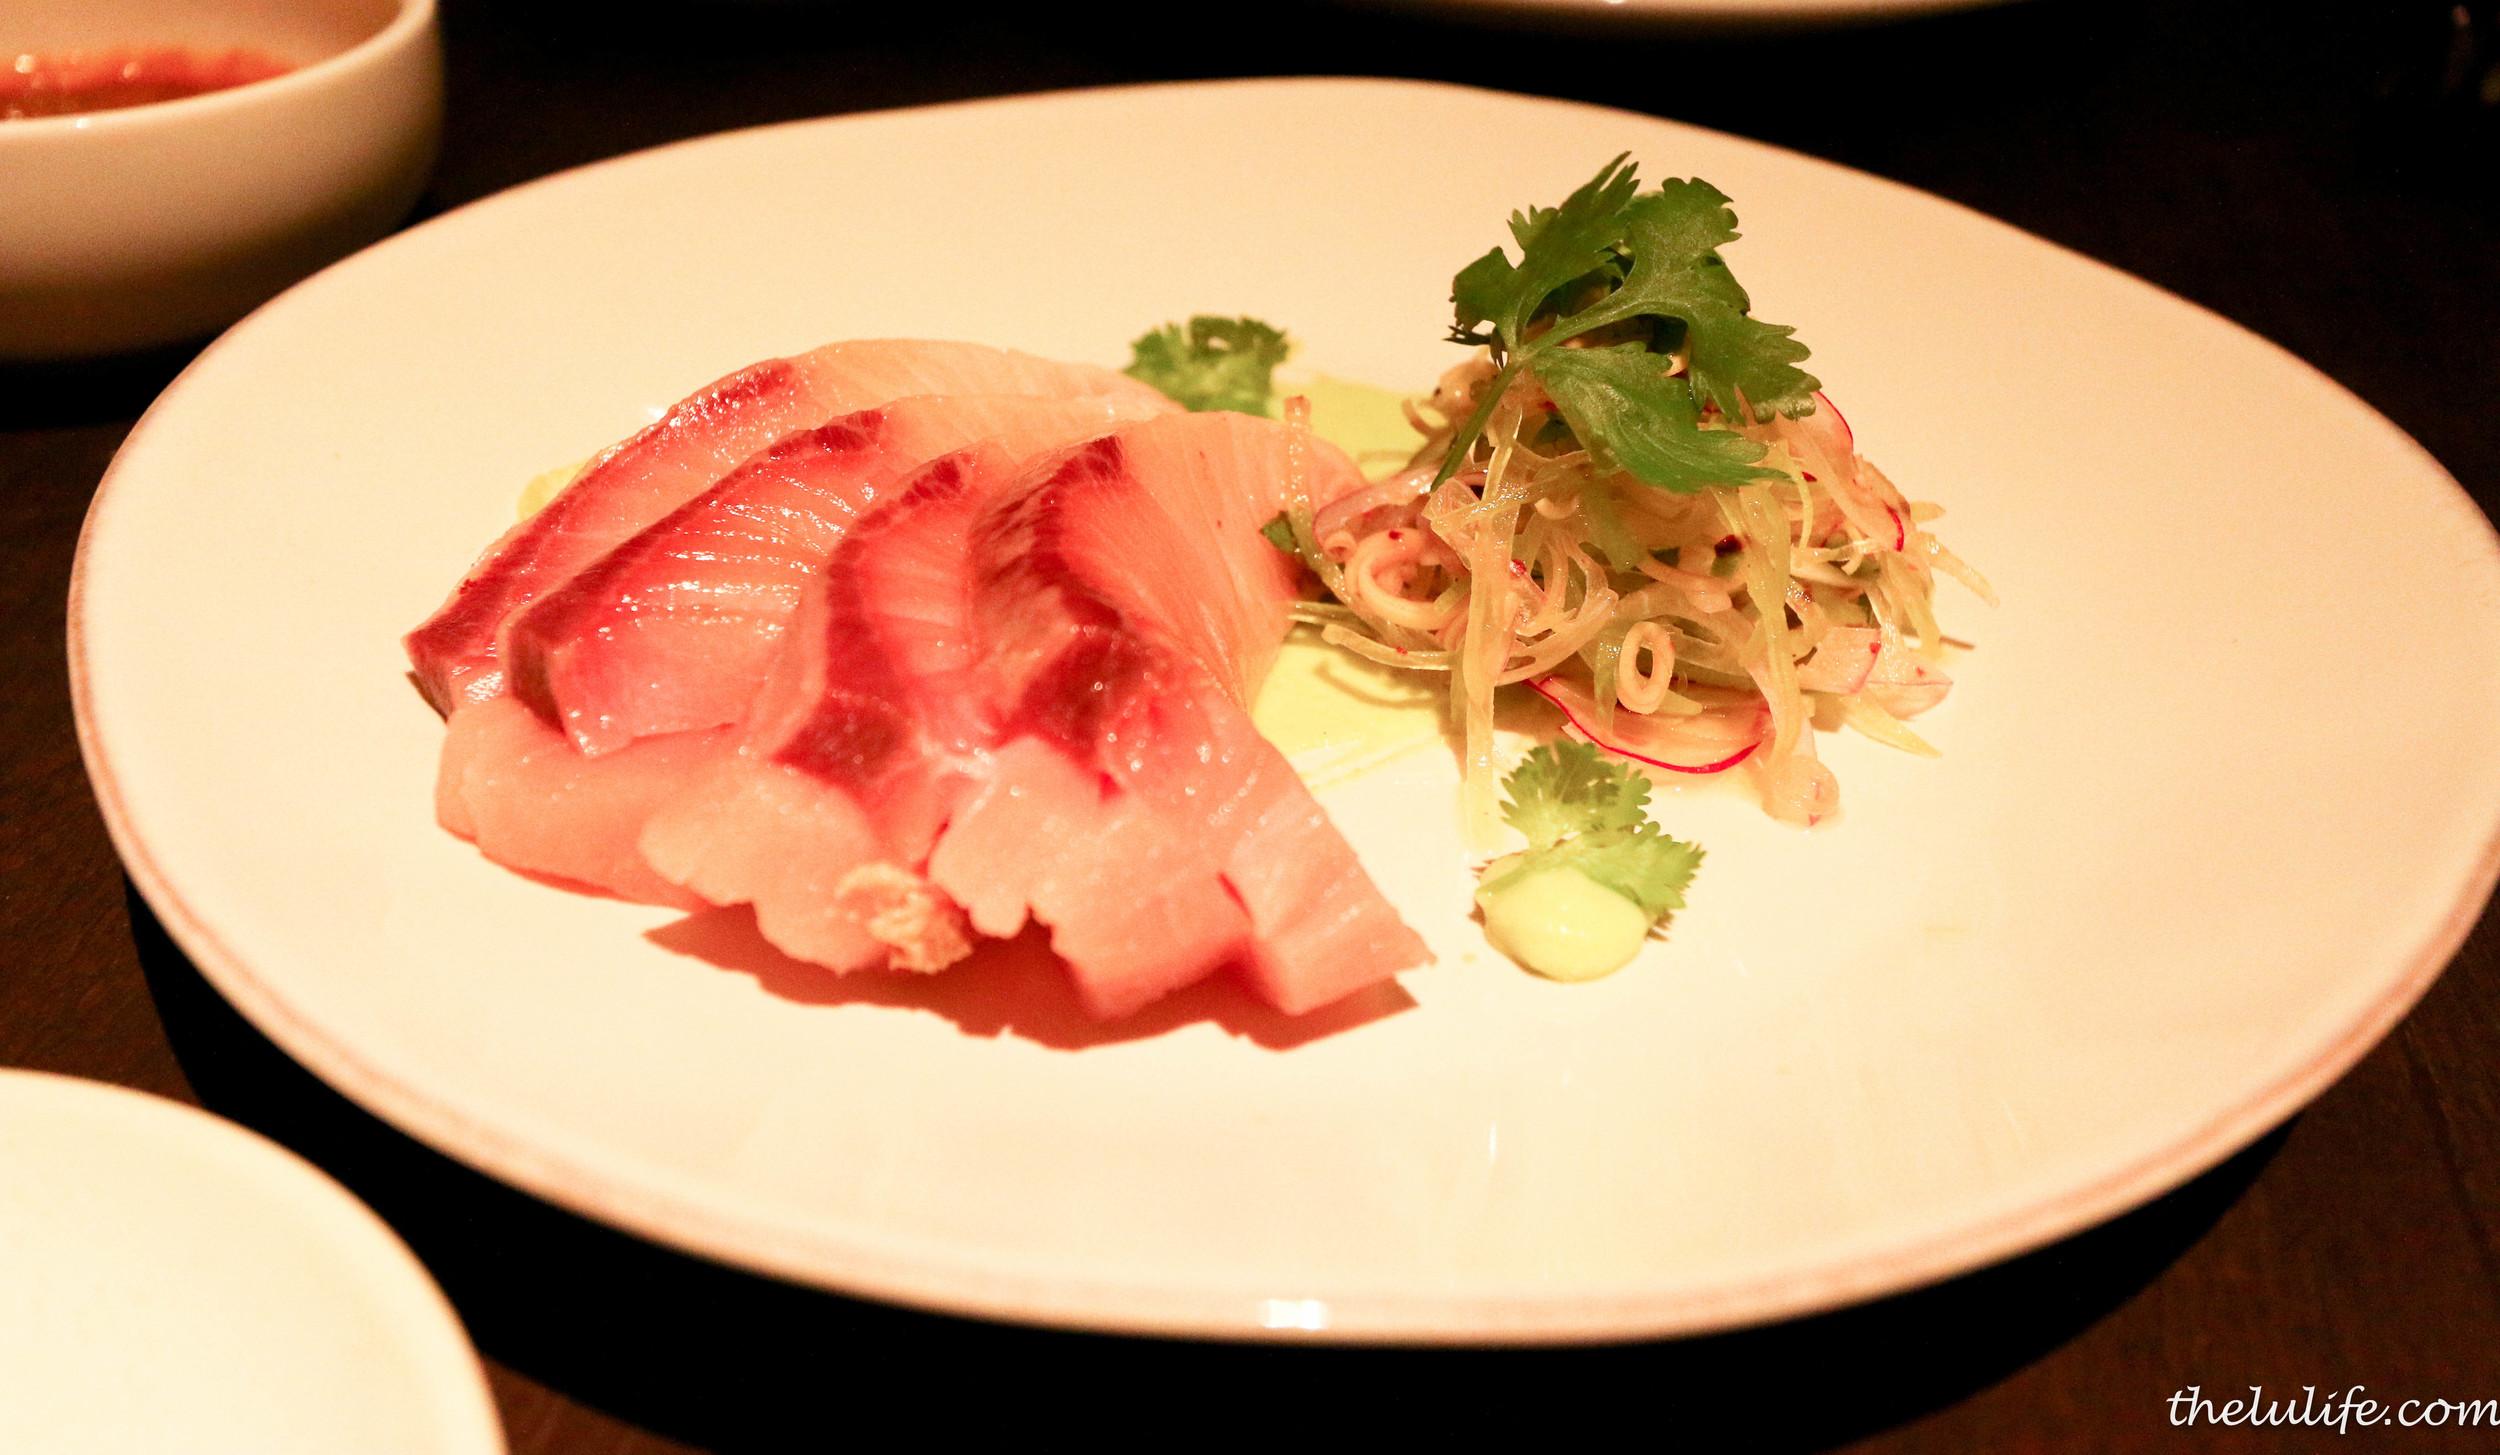 Hamachi with cucumber and lemongrass salad and wasabi puree